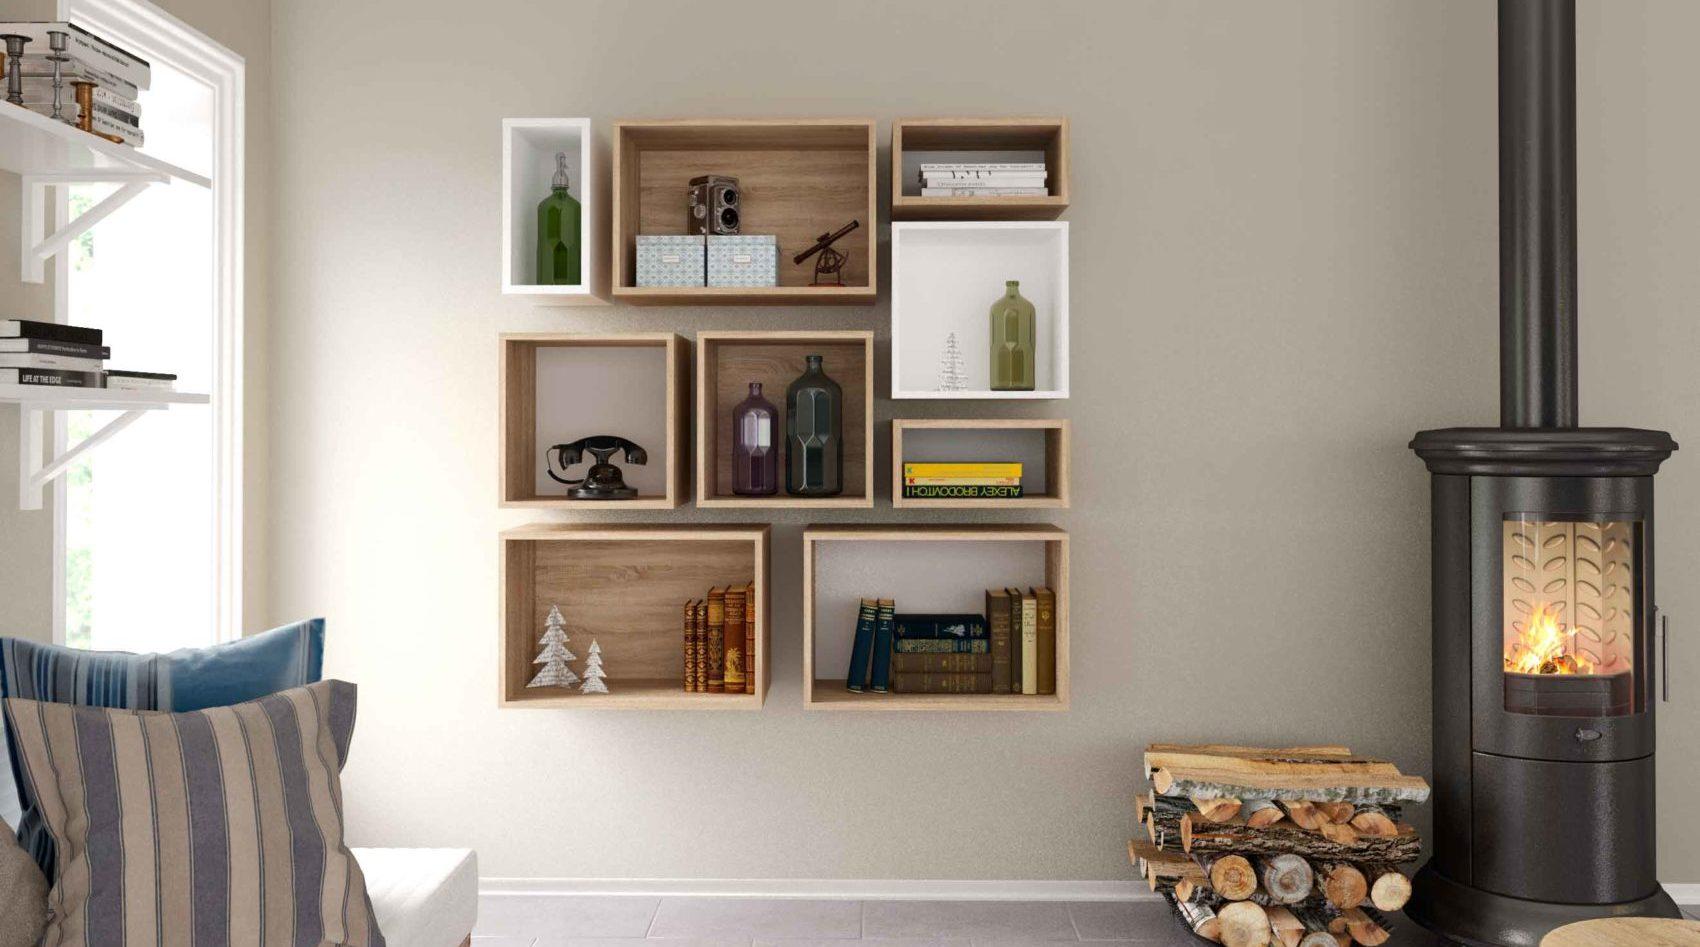 Como organizar tu hogar con estanterías originales